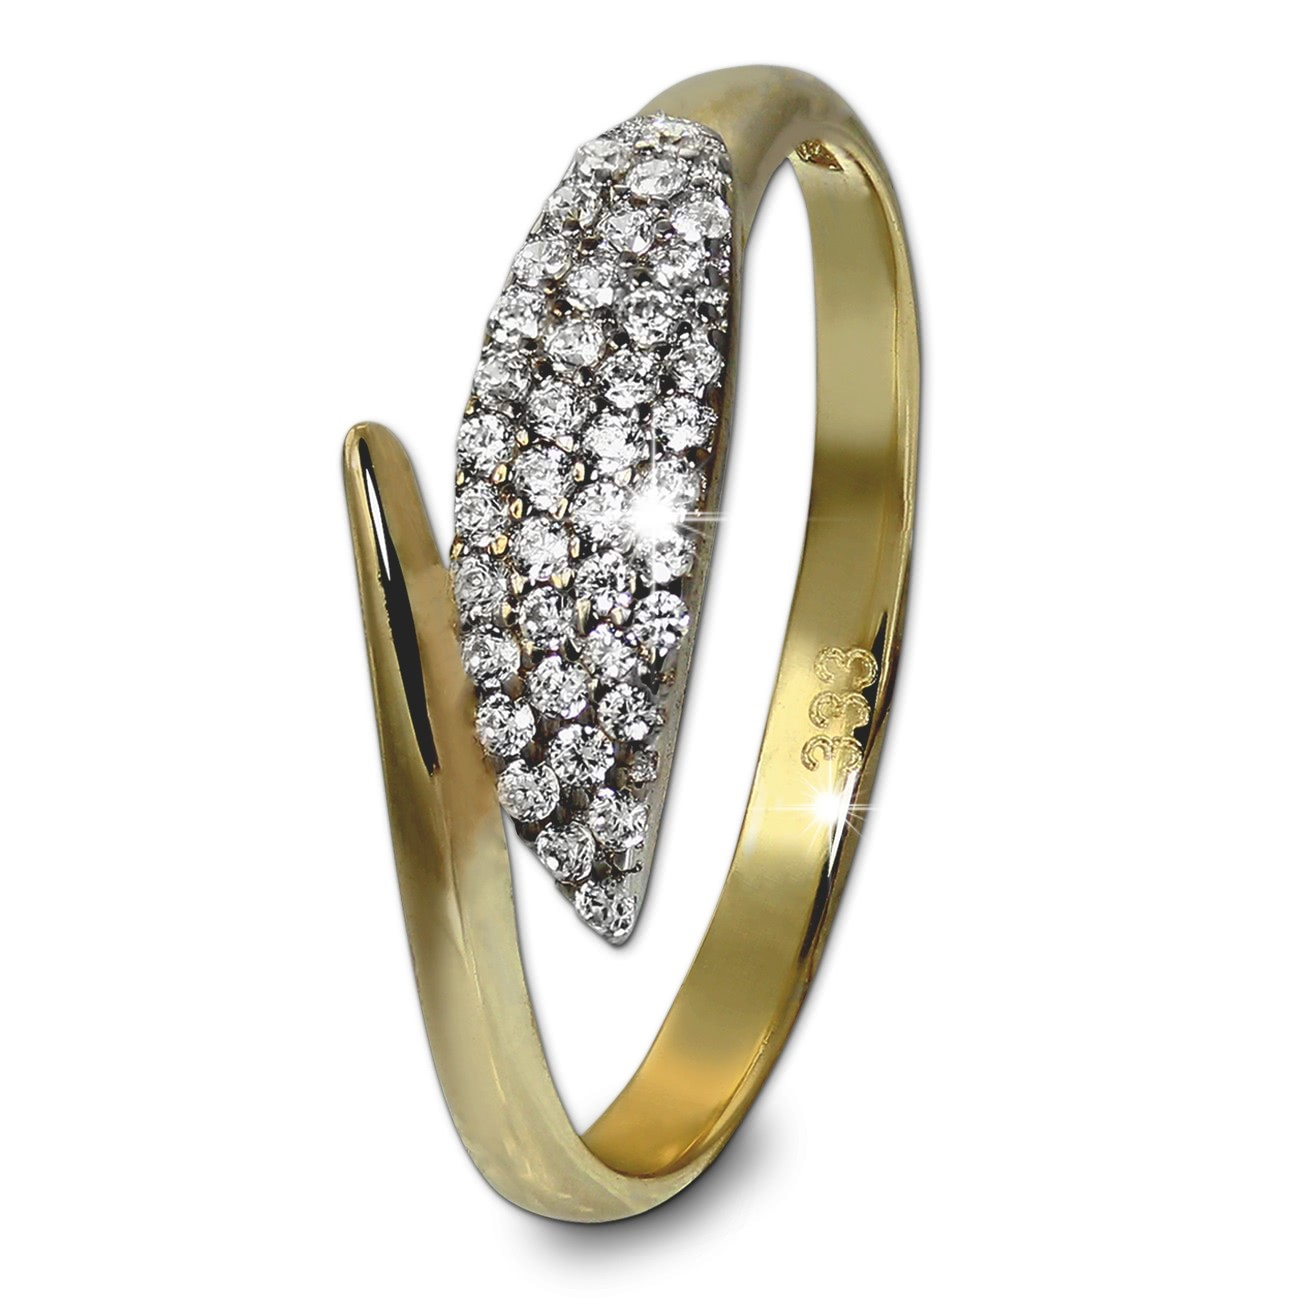 GoldDream Gold Ring Blatt Gr.54 Zirkonia weiß 333er Gelbgold GDR517Y54